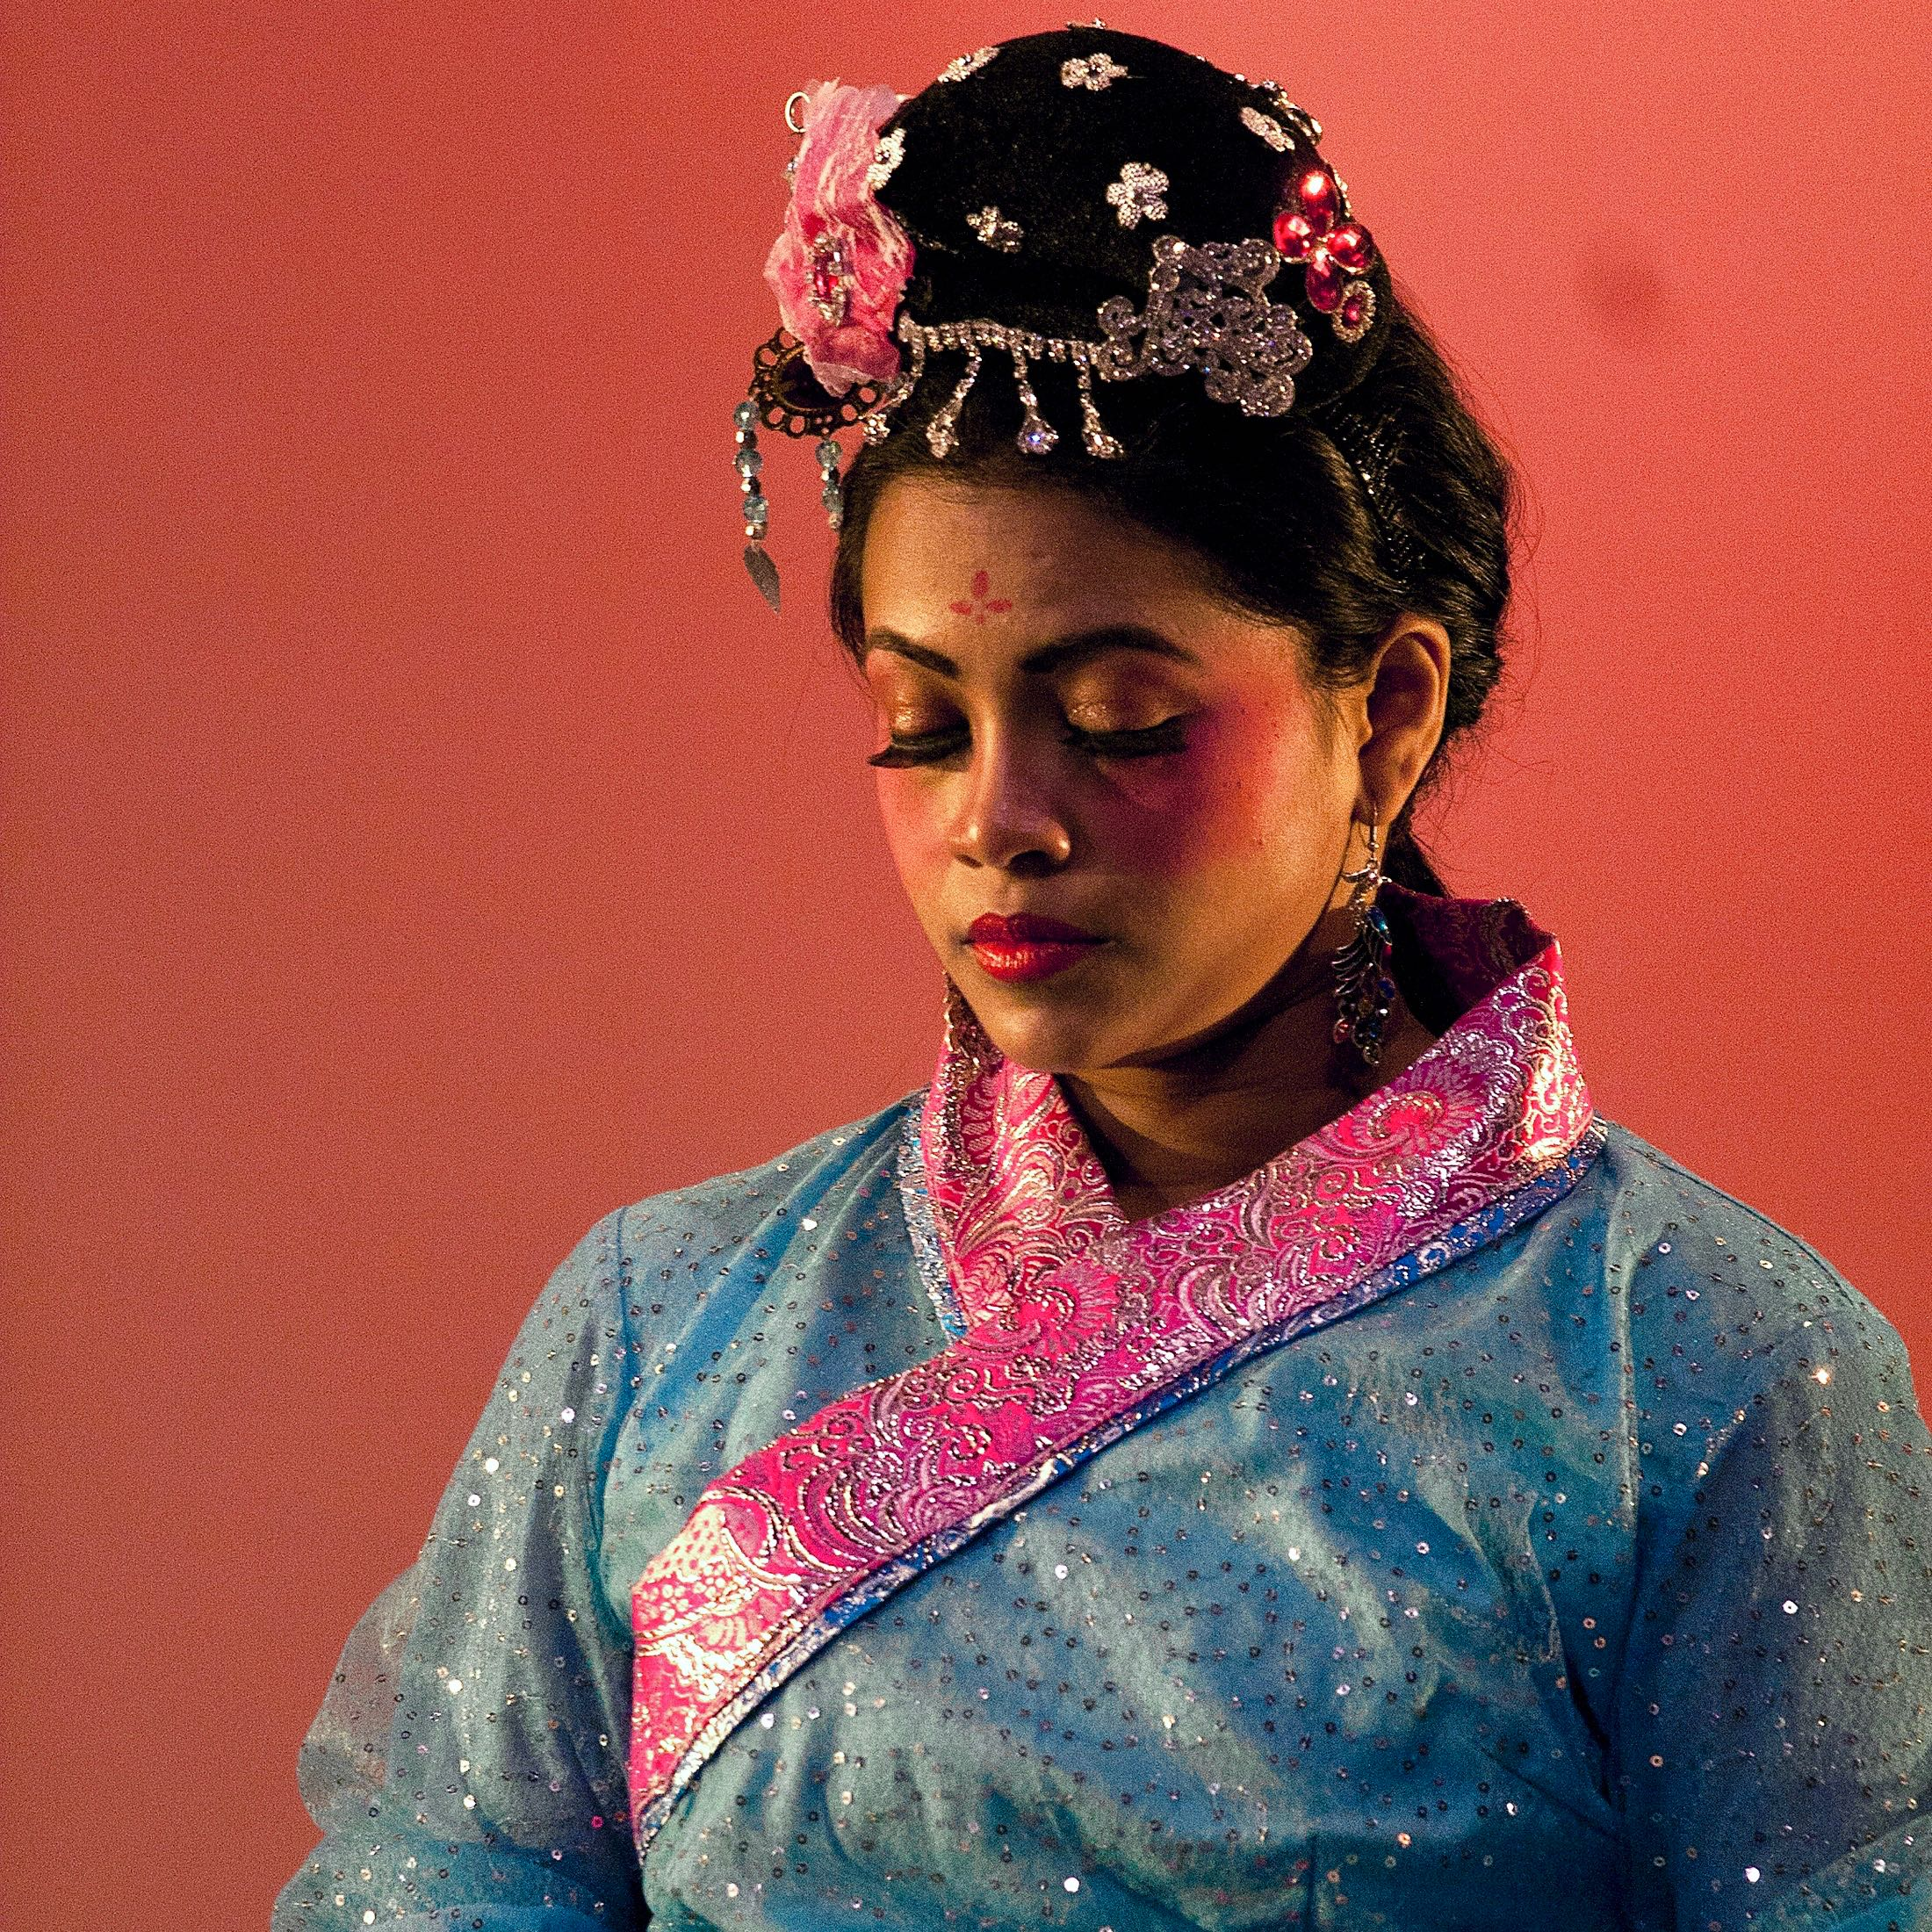 drum-dance-of-the-han-dynasty - 1.jpg